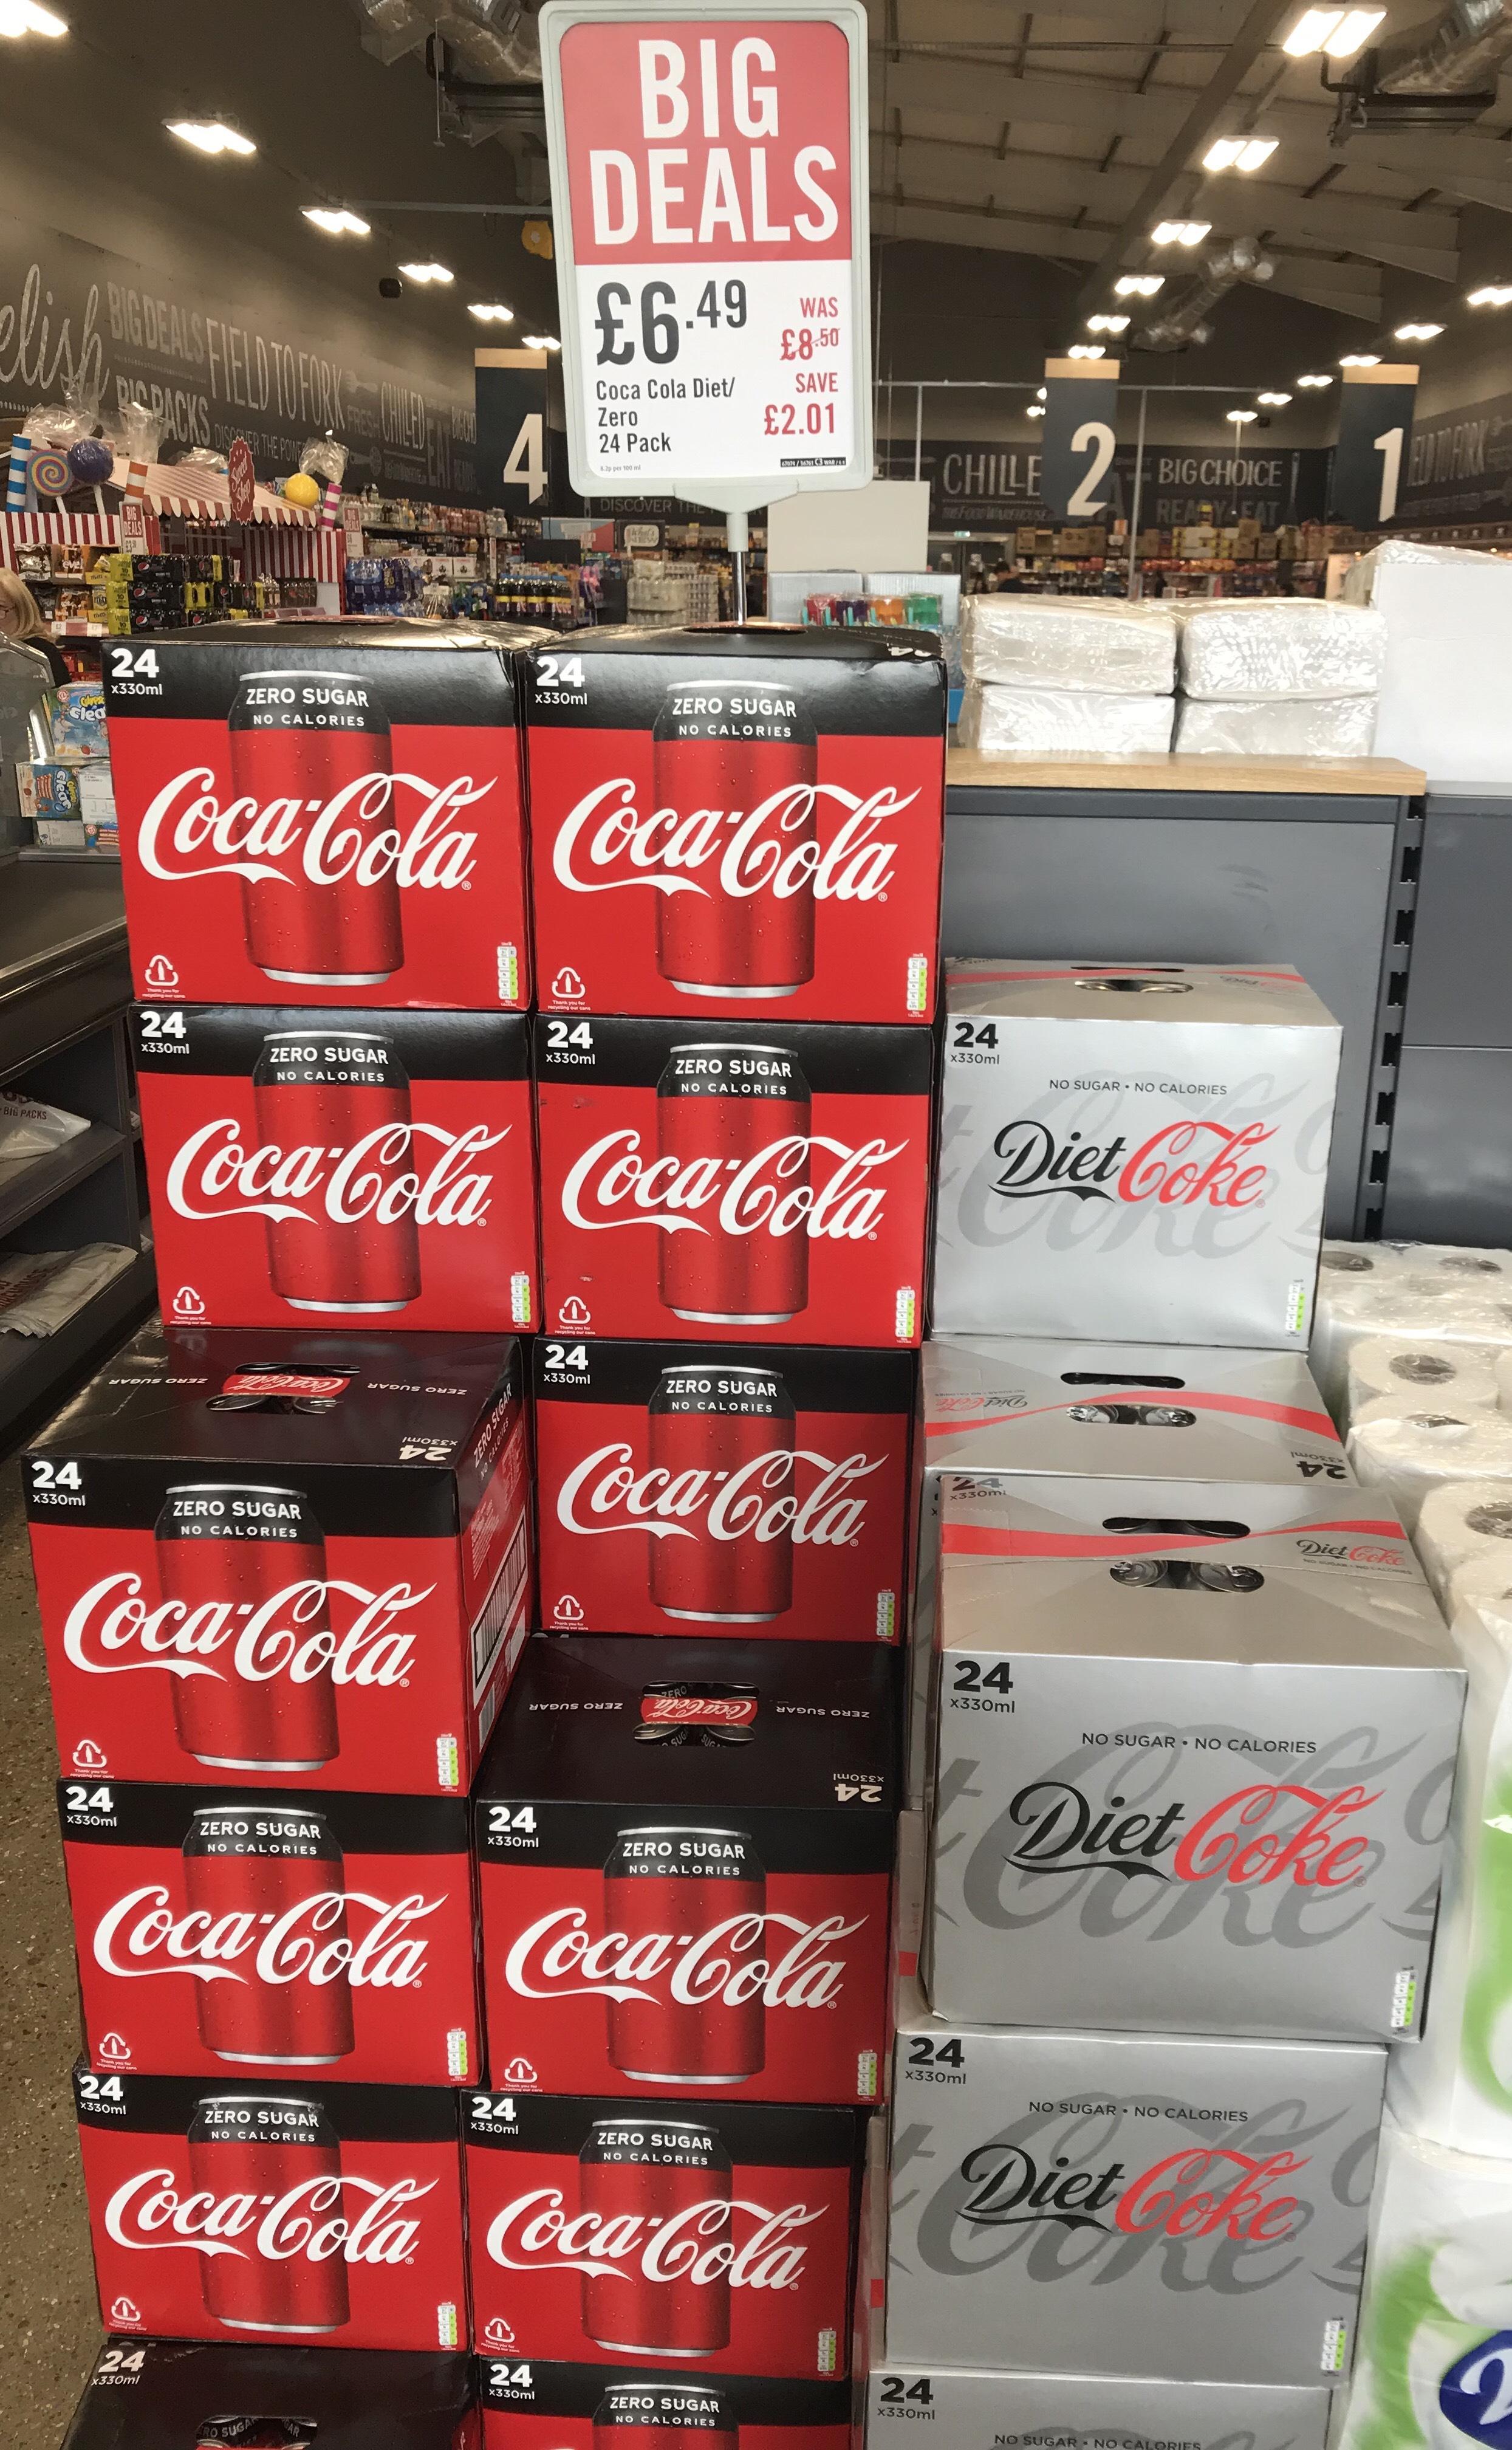 24 Pack Diet Coke or Coke Zero £6.49 at Food Warehouse